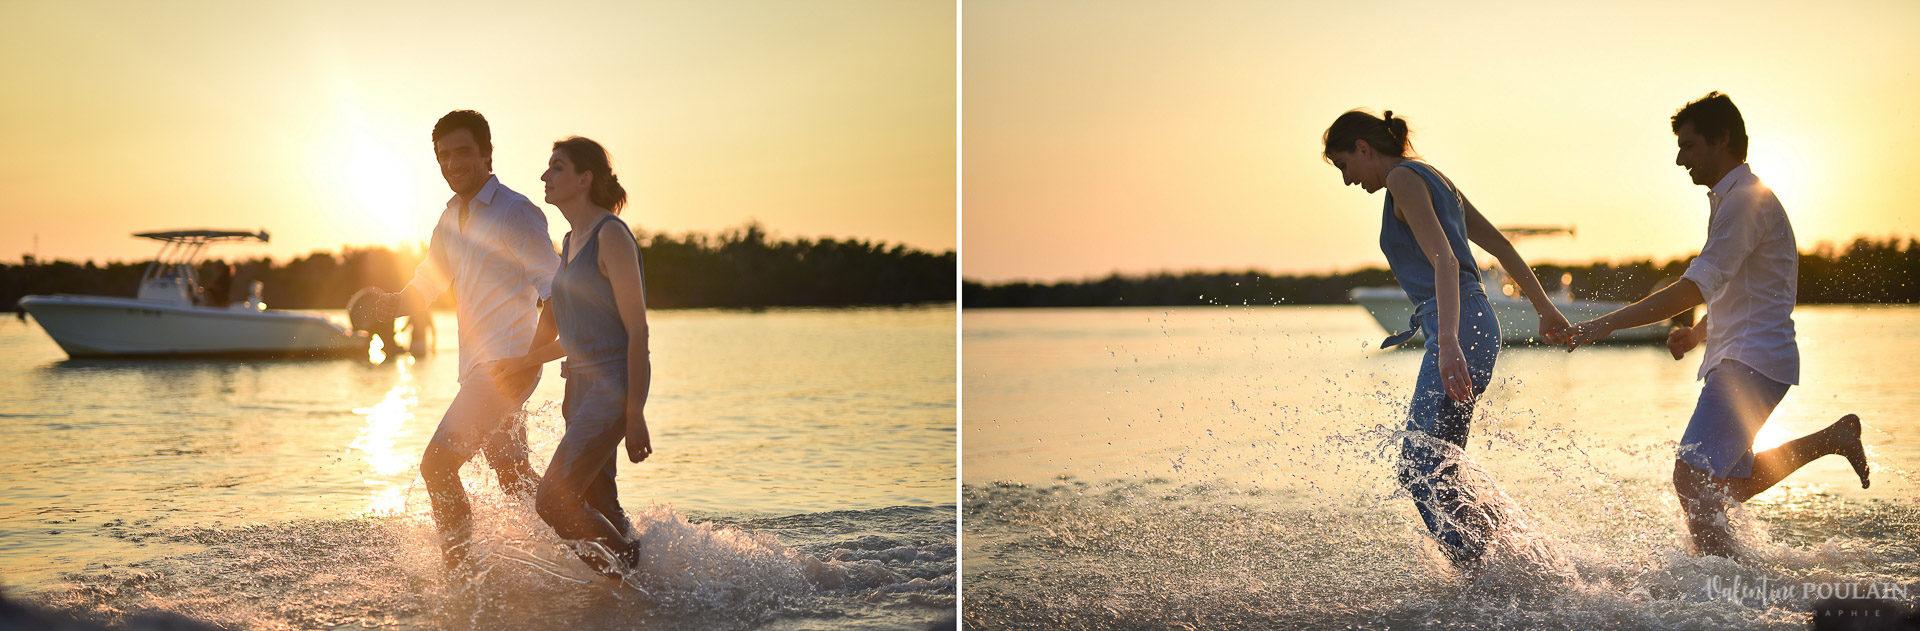 Couple Miam Keys Florida - Valentine Poulain plage